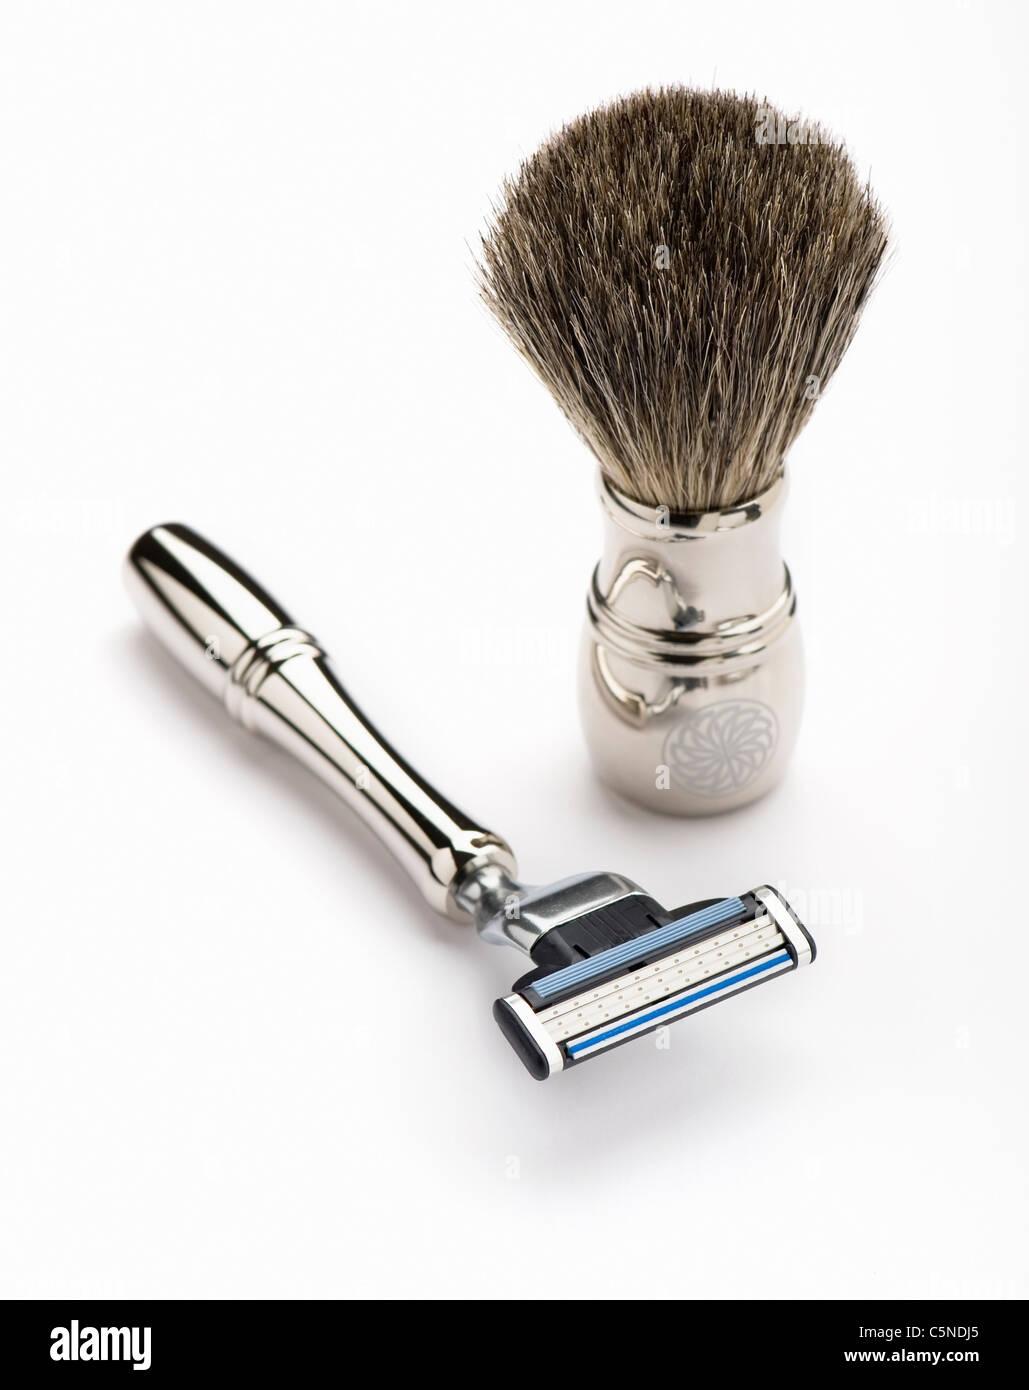 A silver razor and shaving brush - Stock Image